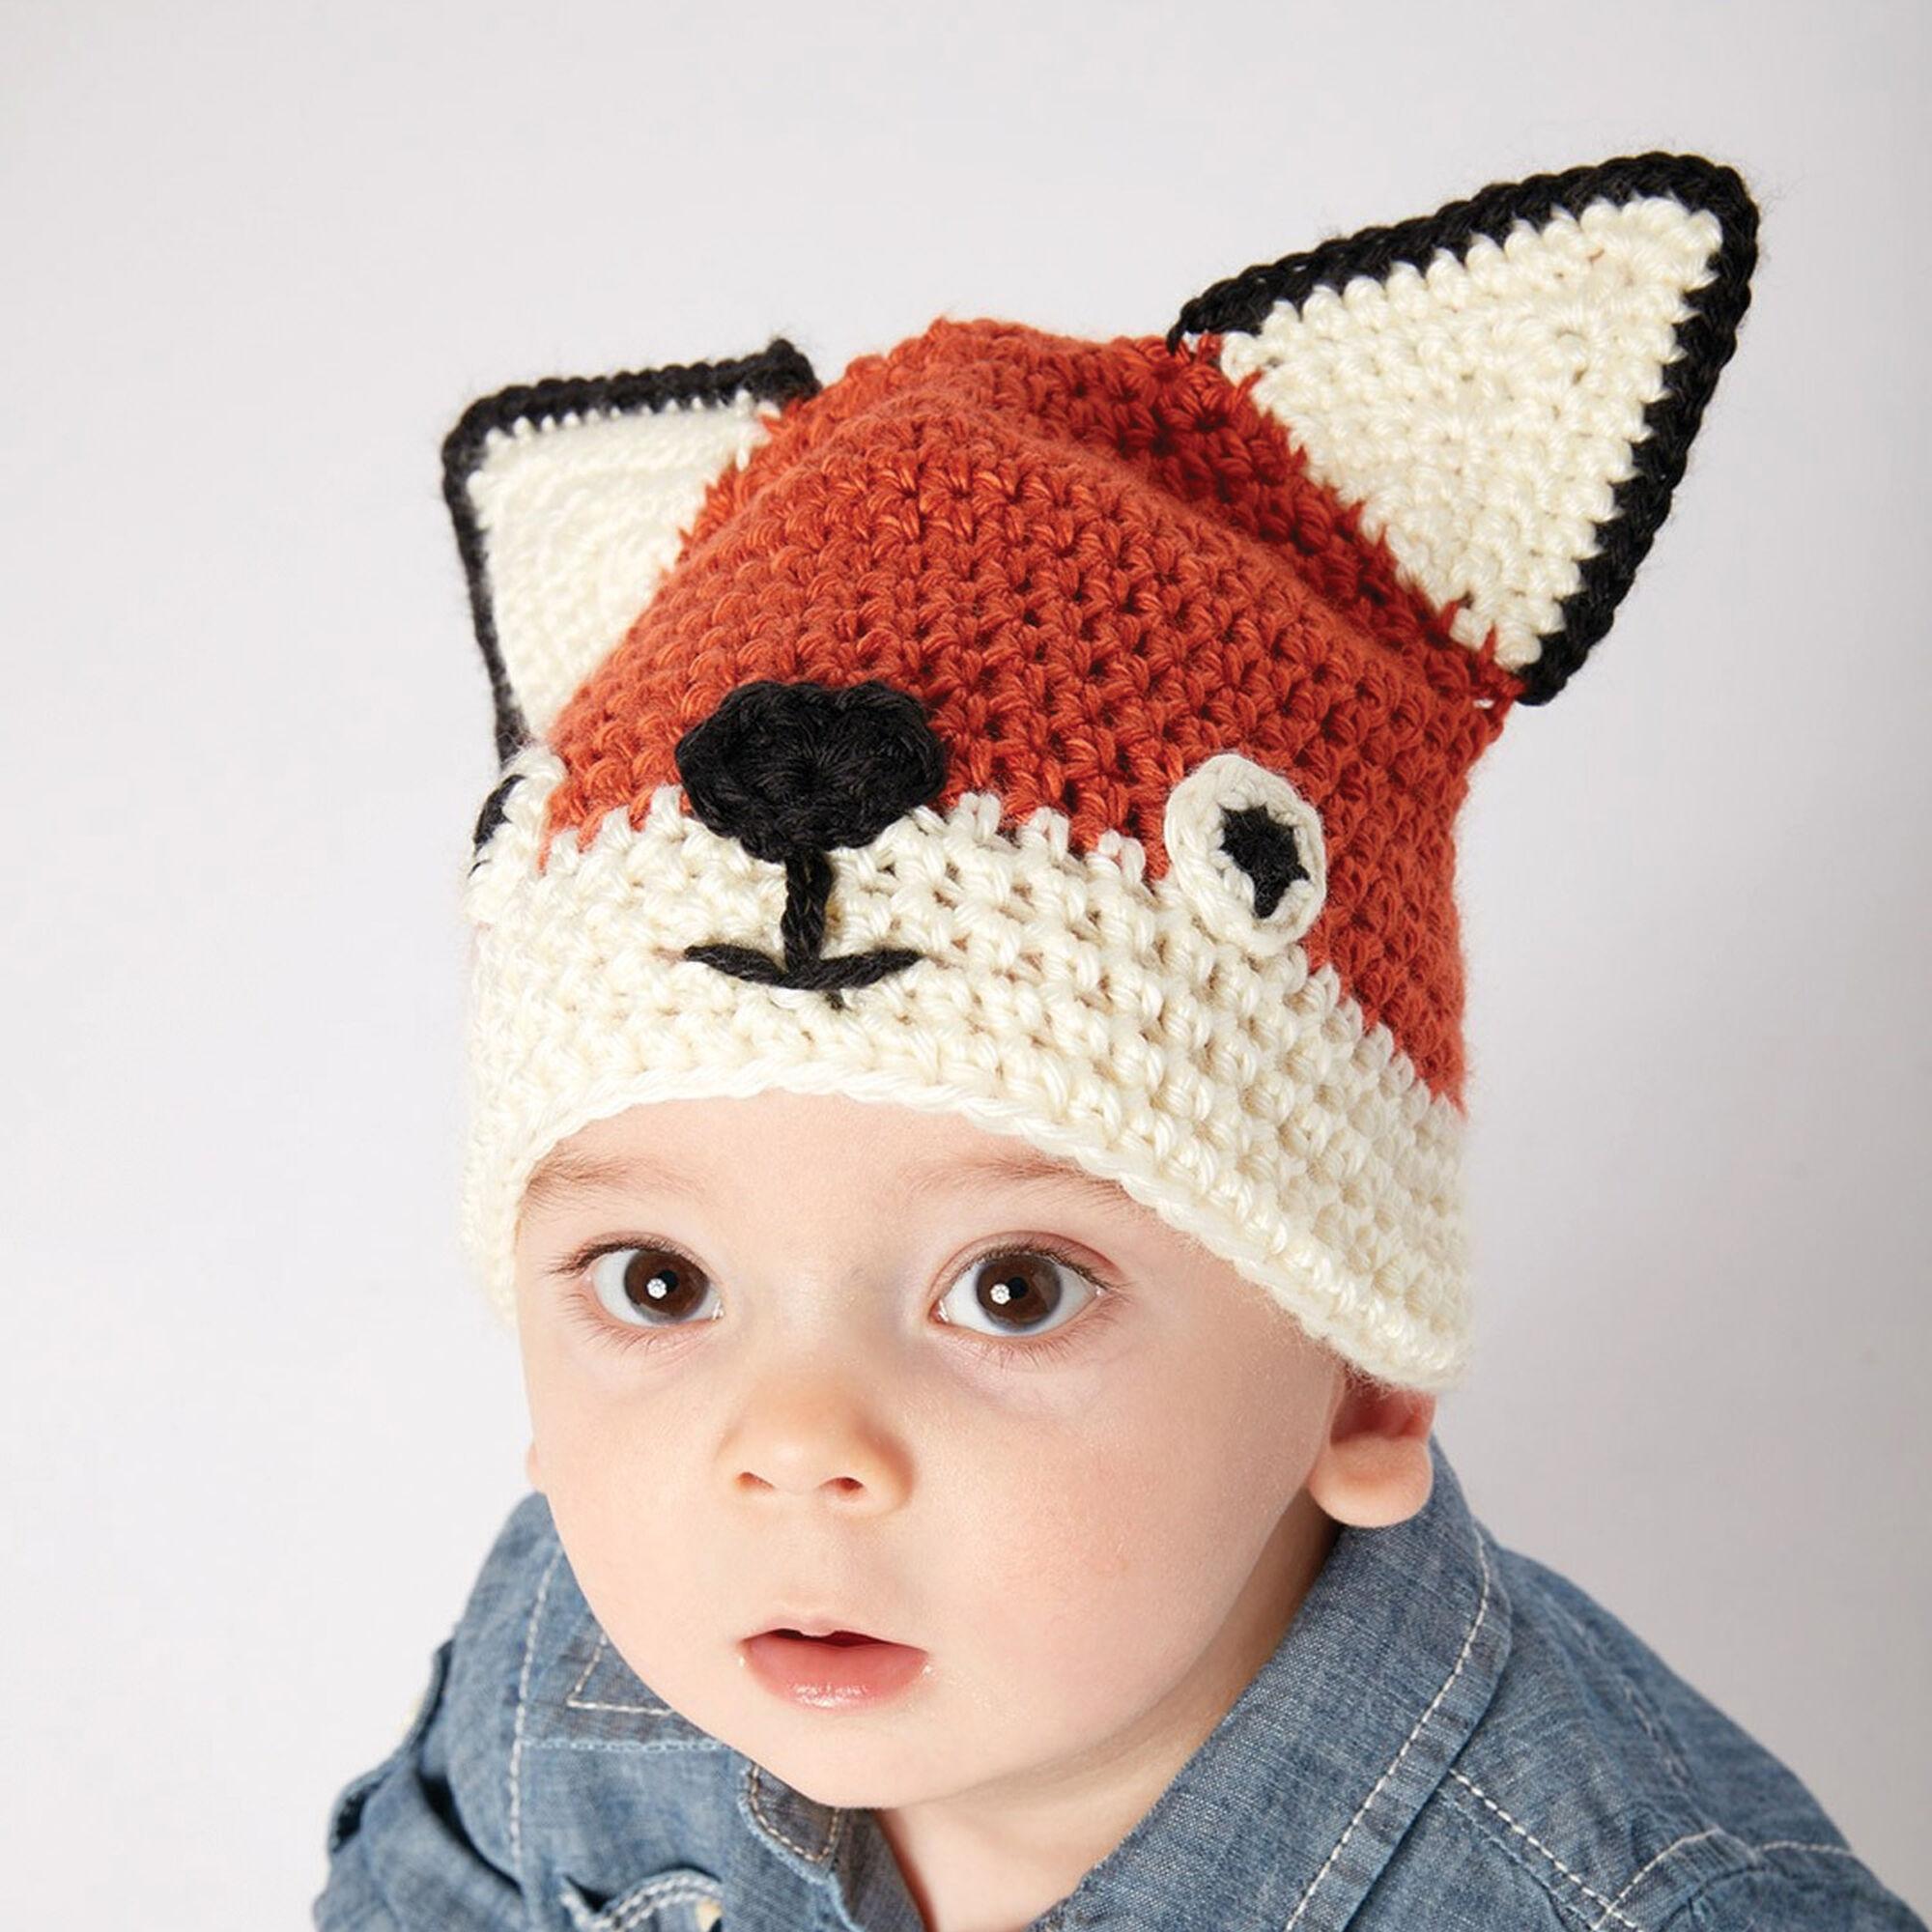 Crochet Fox Hat Pattern Free Interesting Design